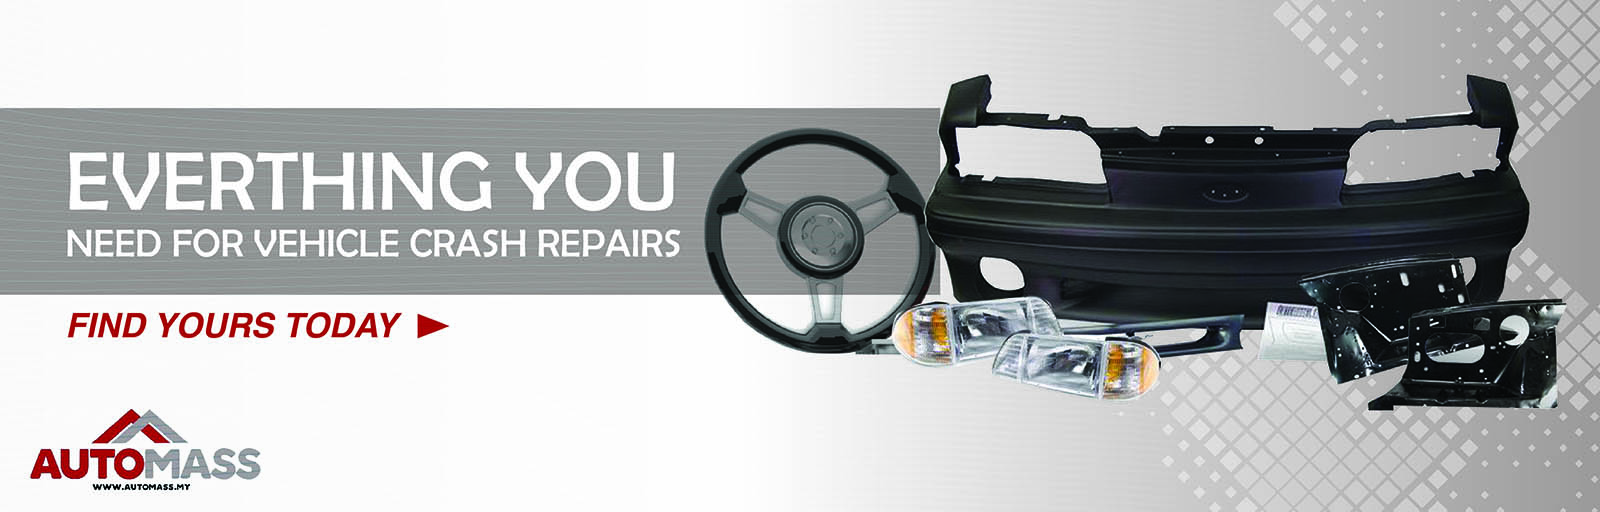 Get Hua Hong Auto Spare Parts @ Automass